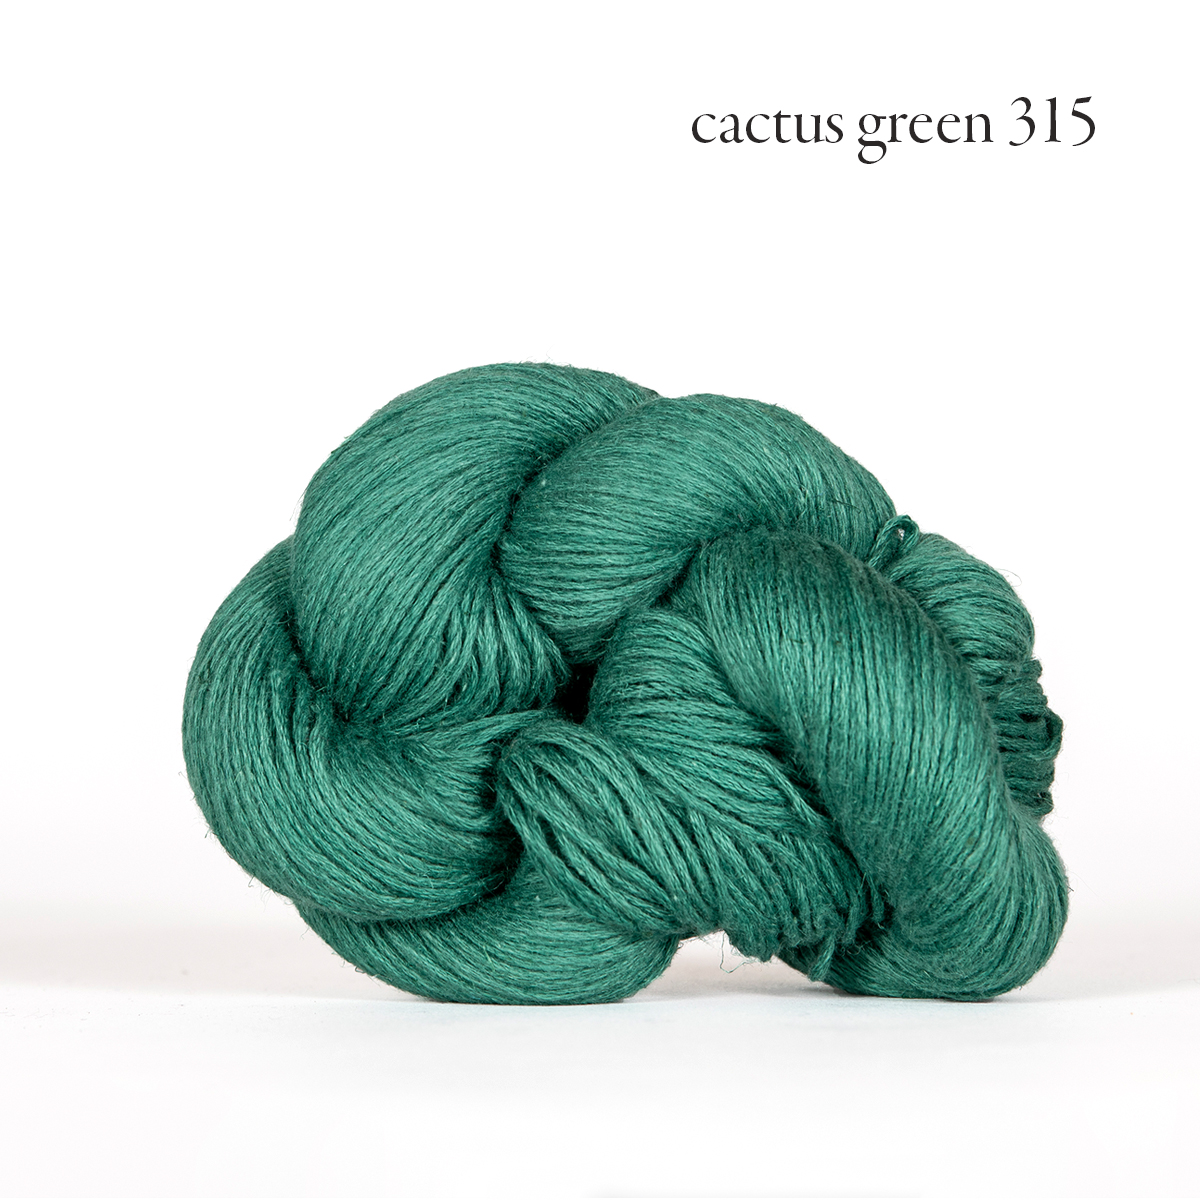 mojave cactus green 315.jpg